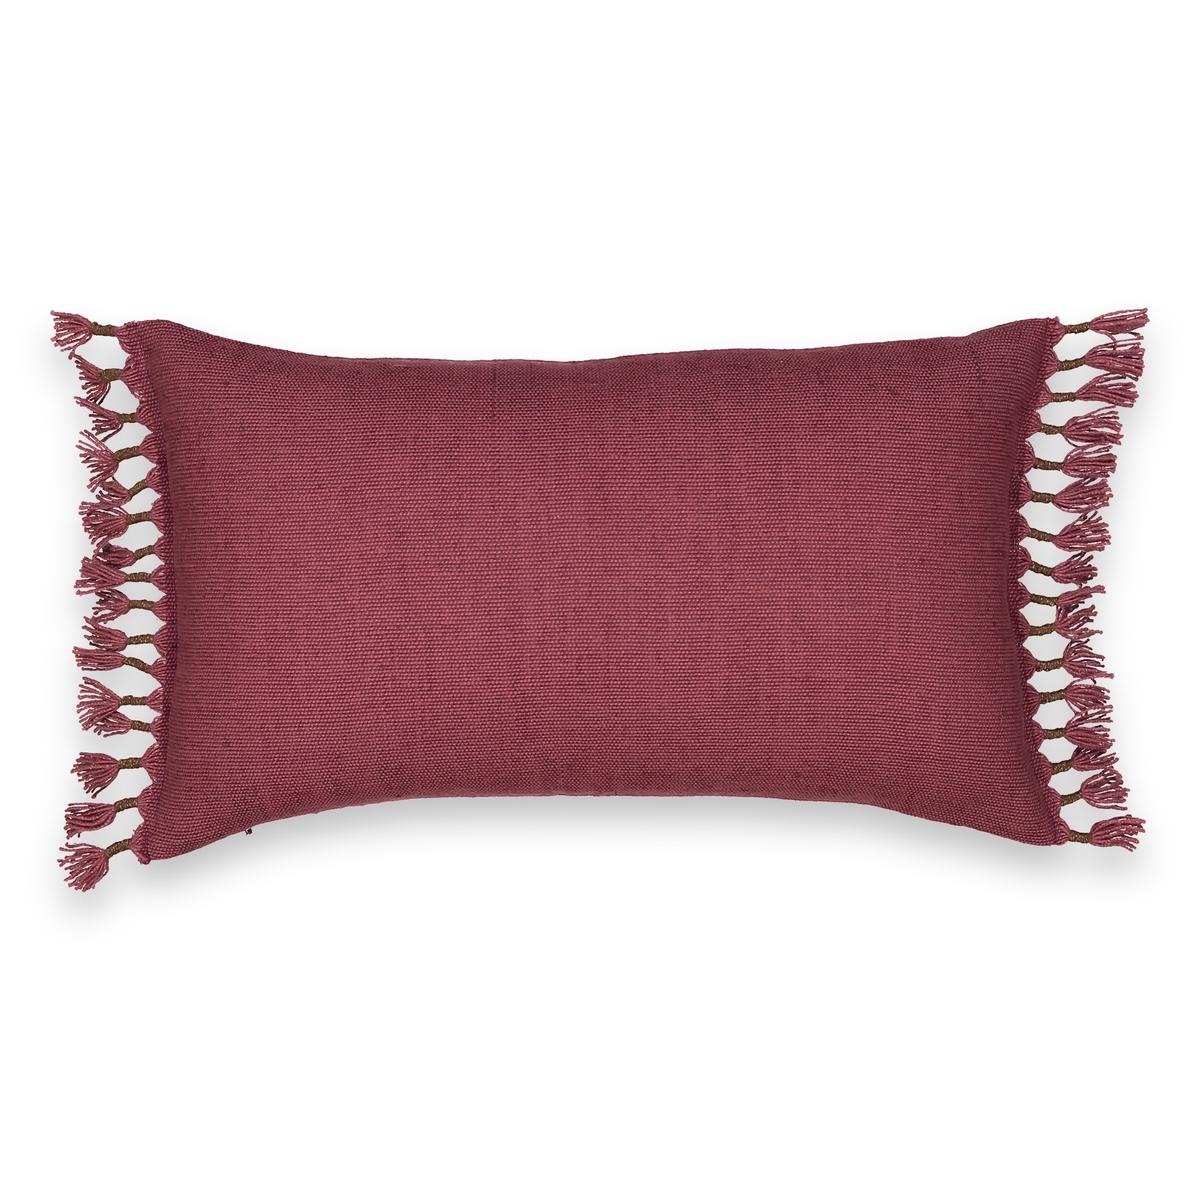 Фото - Чехол на подушку-валик из хлопка и льна, Timbola чехол на подушку валик tasuna